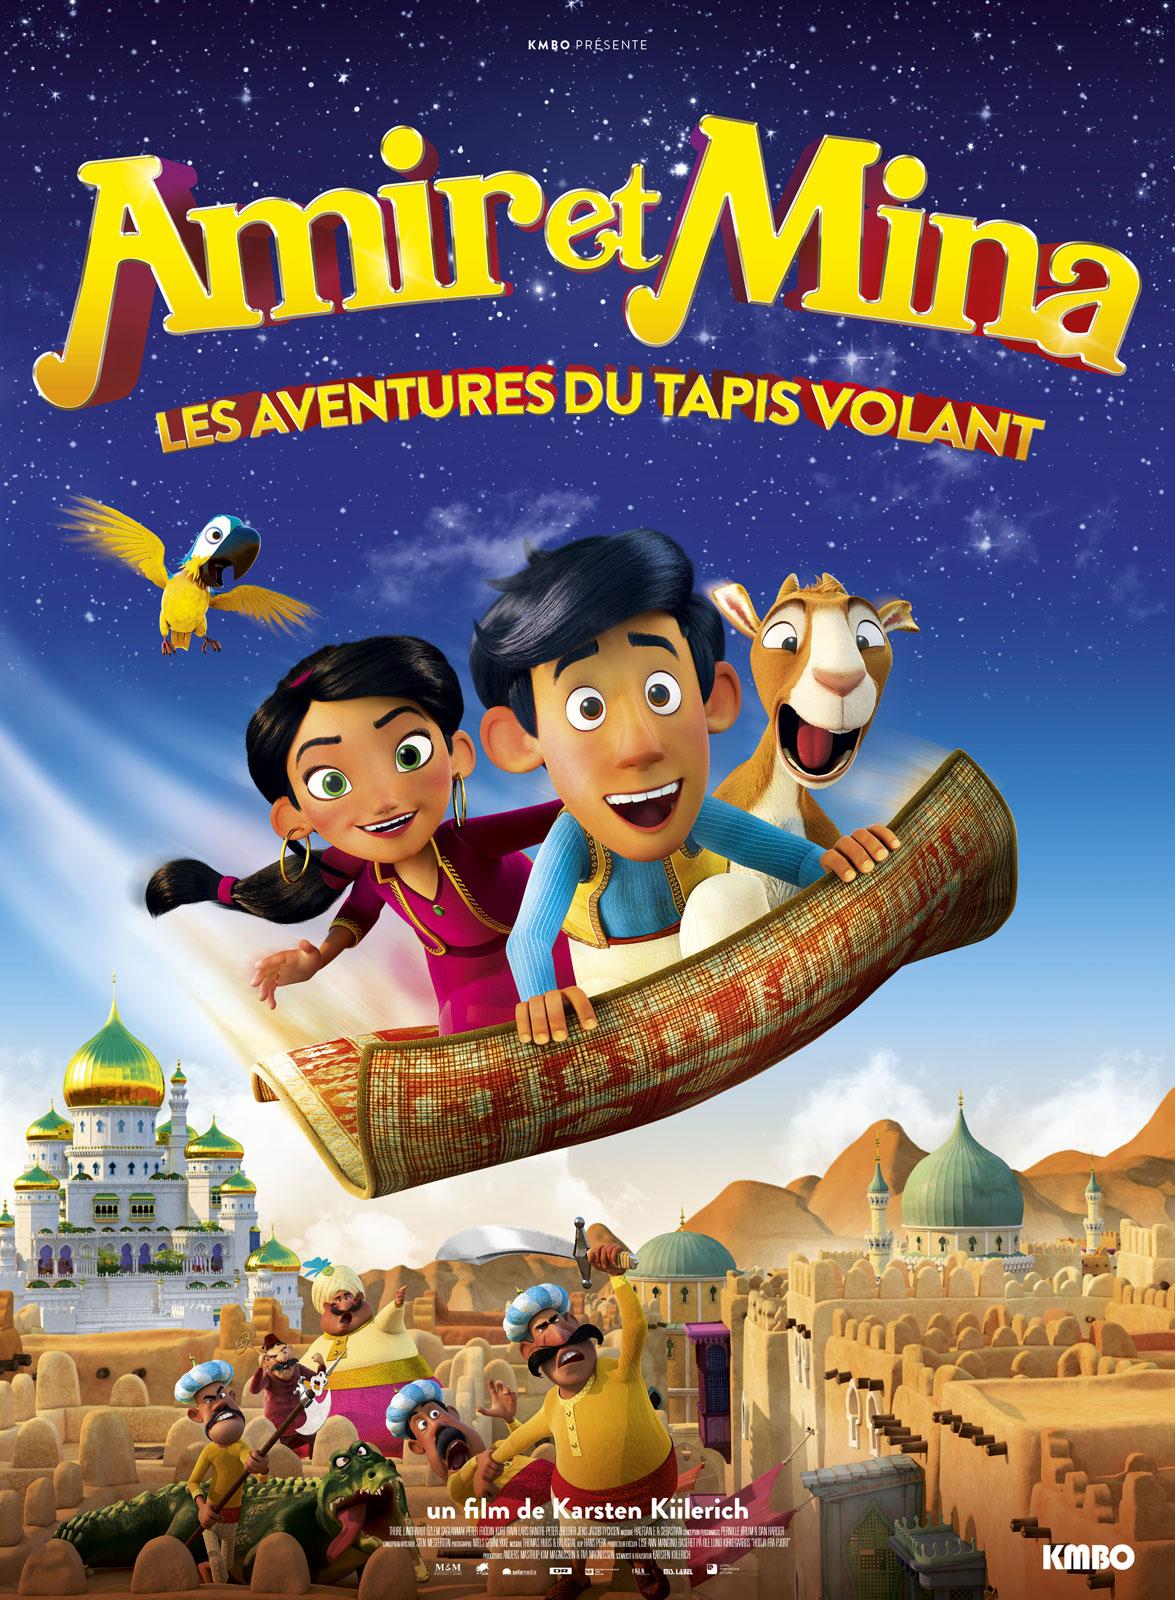 Image du film Amir et Mina : Les aventures du tapis volant